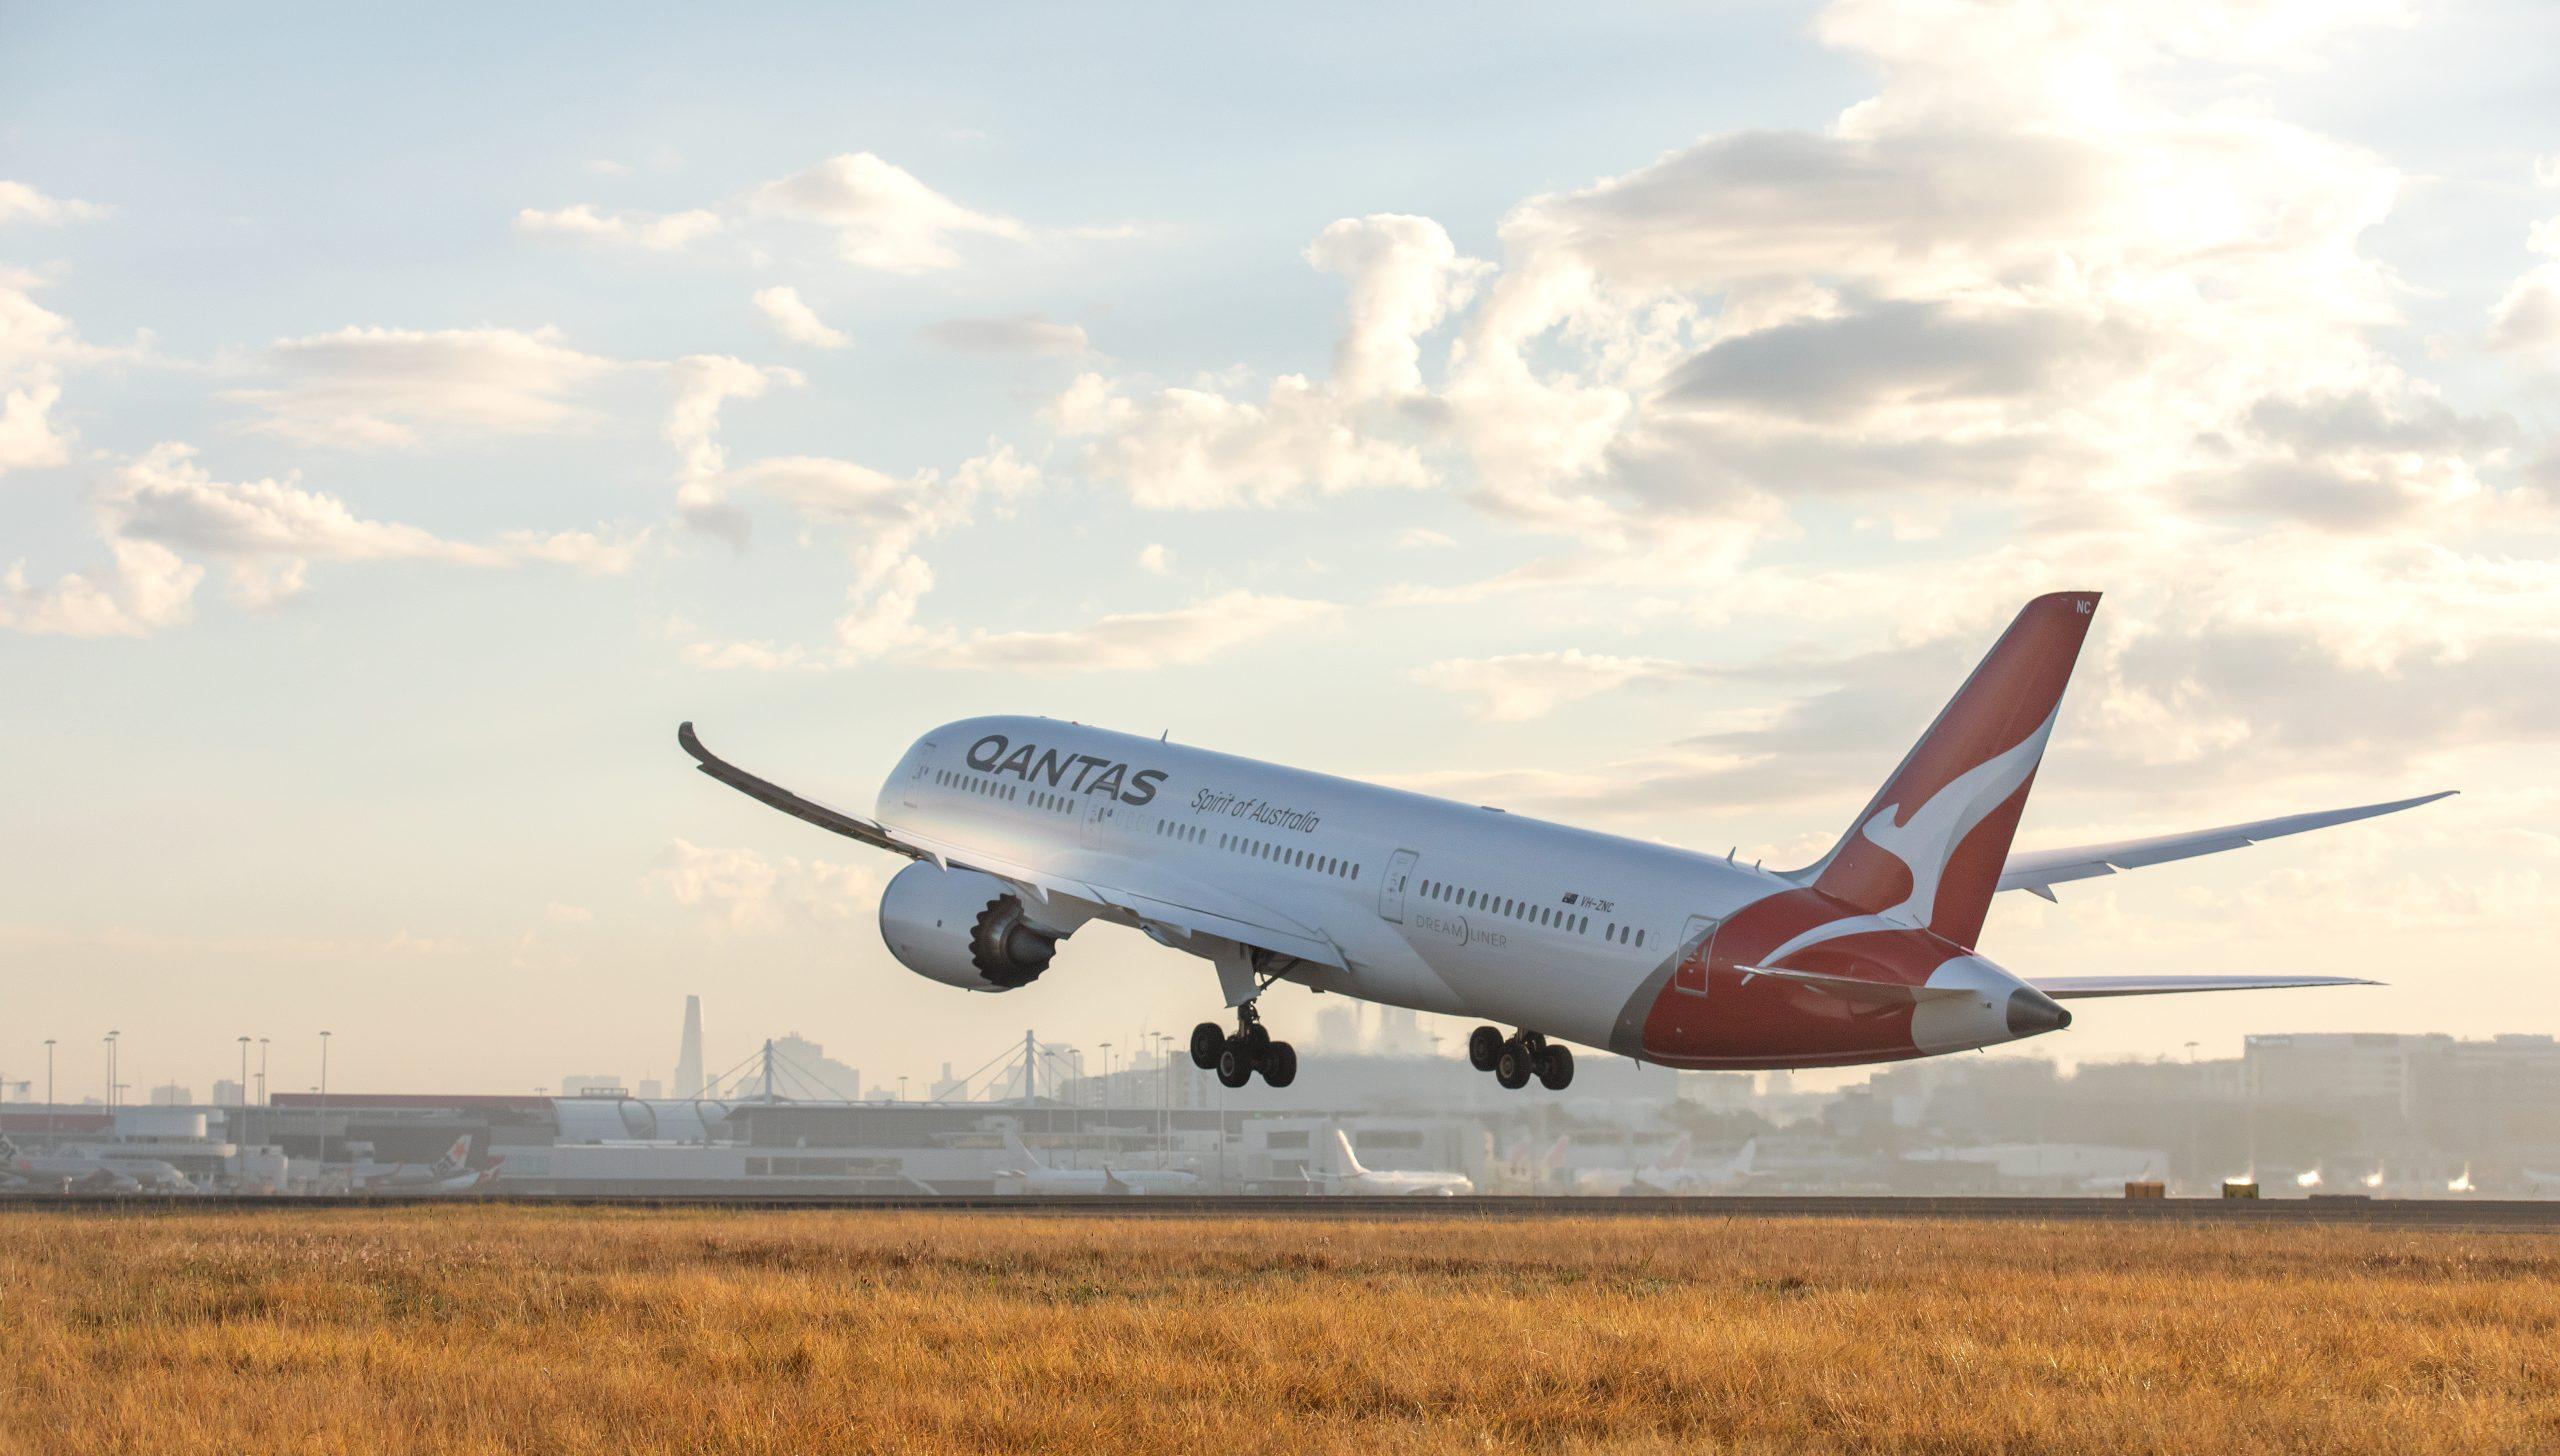 Showing Qantas Airlines plane